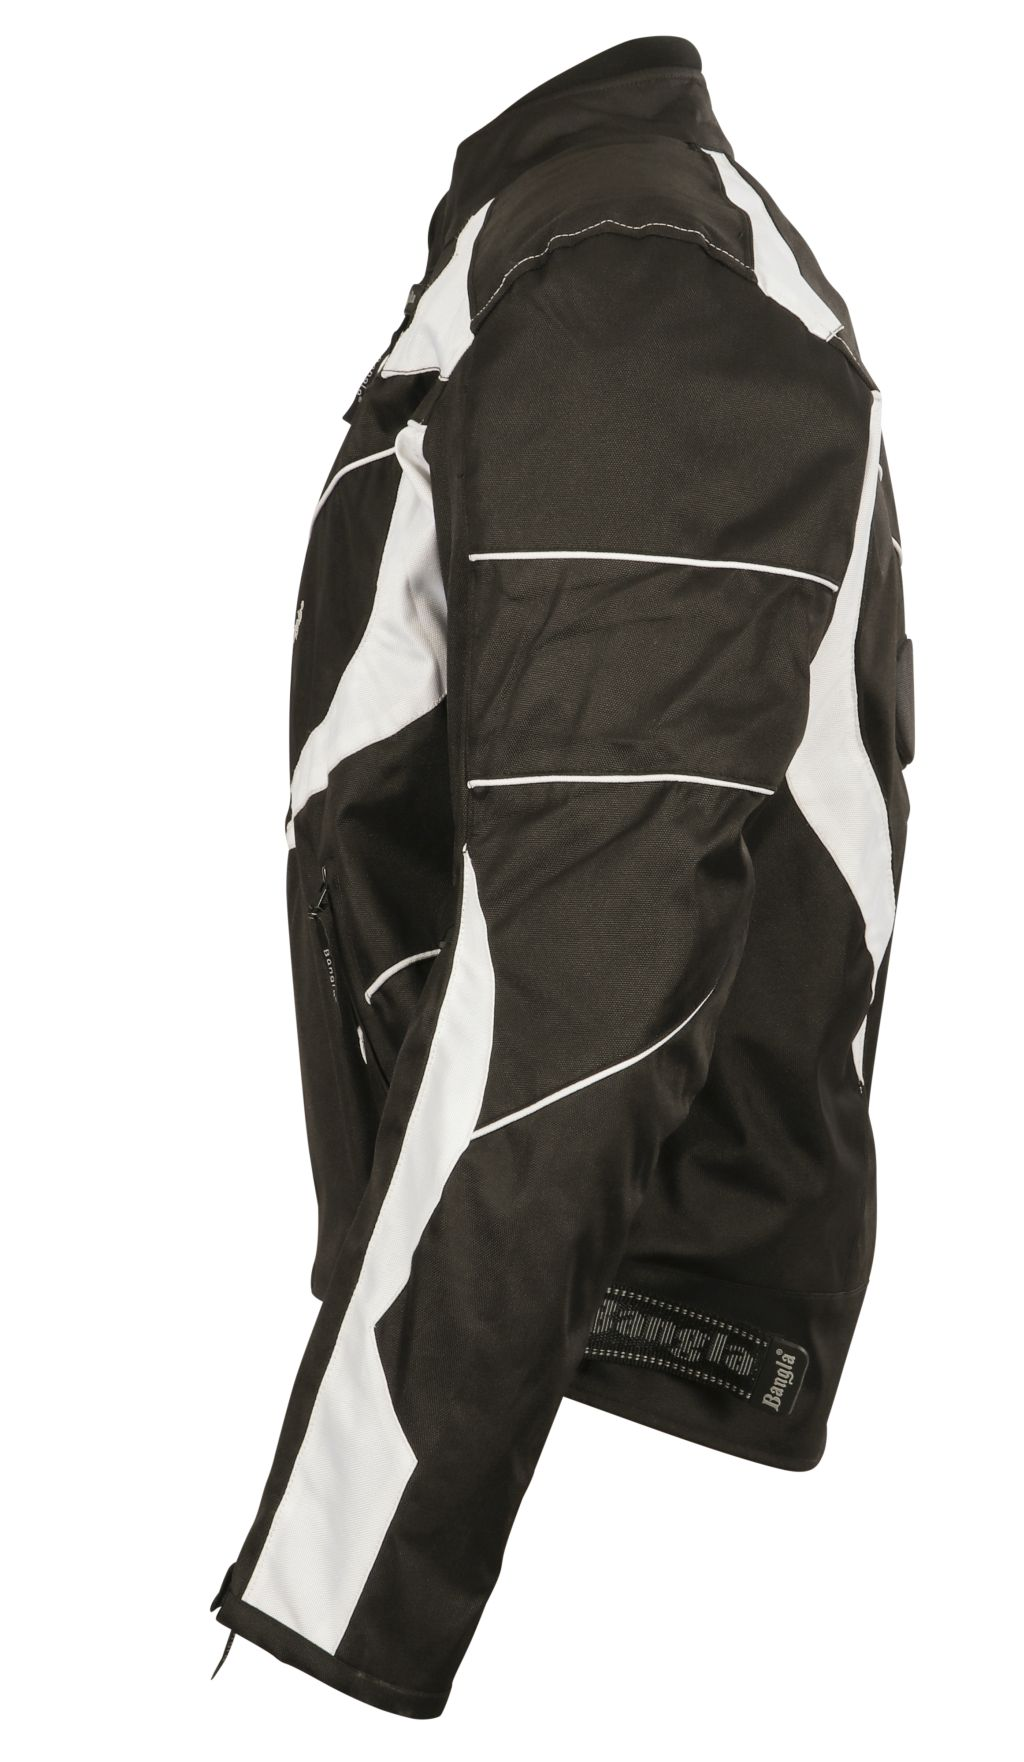 Motorrad Textil Jacke Motorradjacke kurz schwarz weiss M L XL XXL XXXL 4 XL